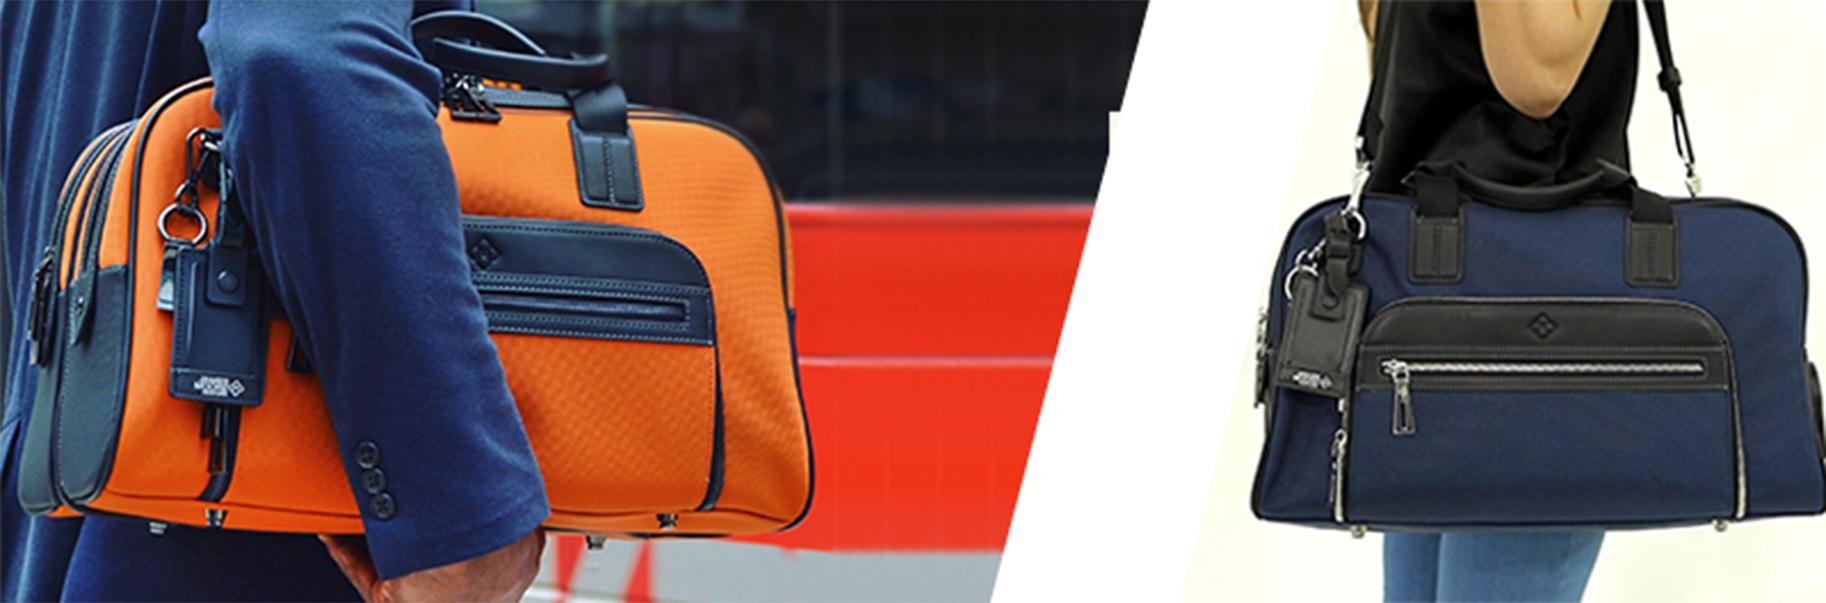 Unisex Atlas Travel Bag